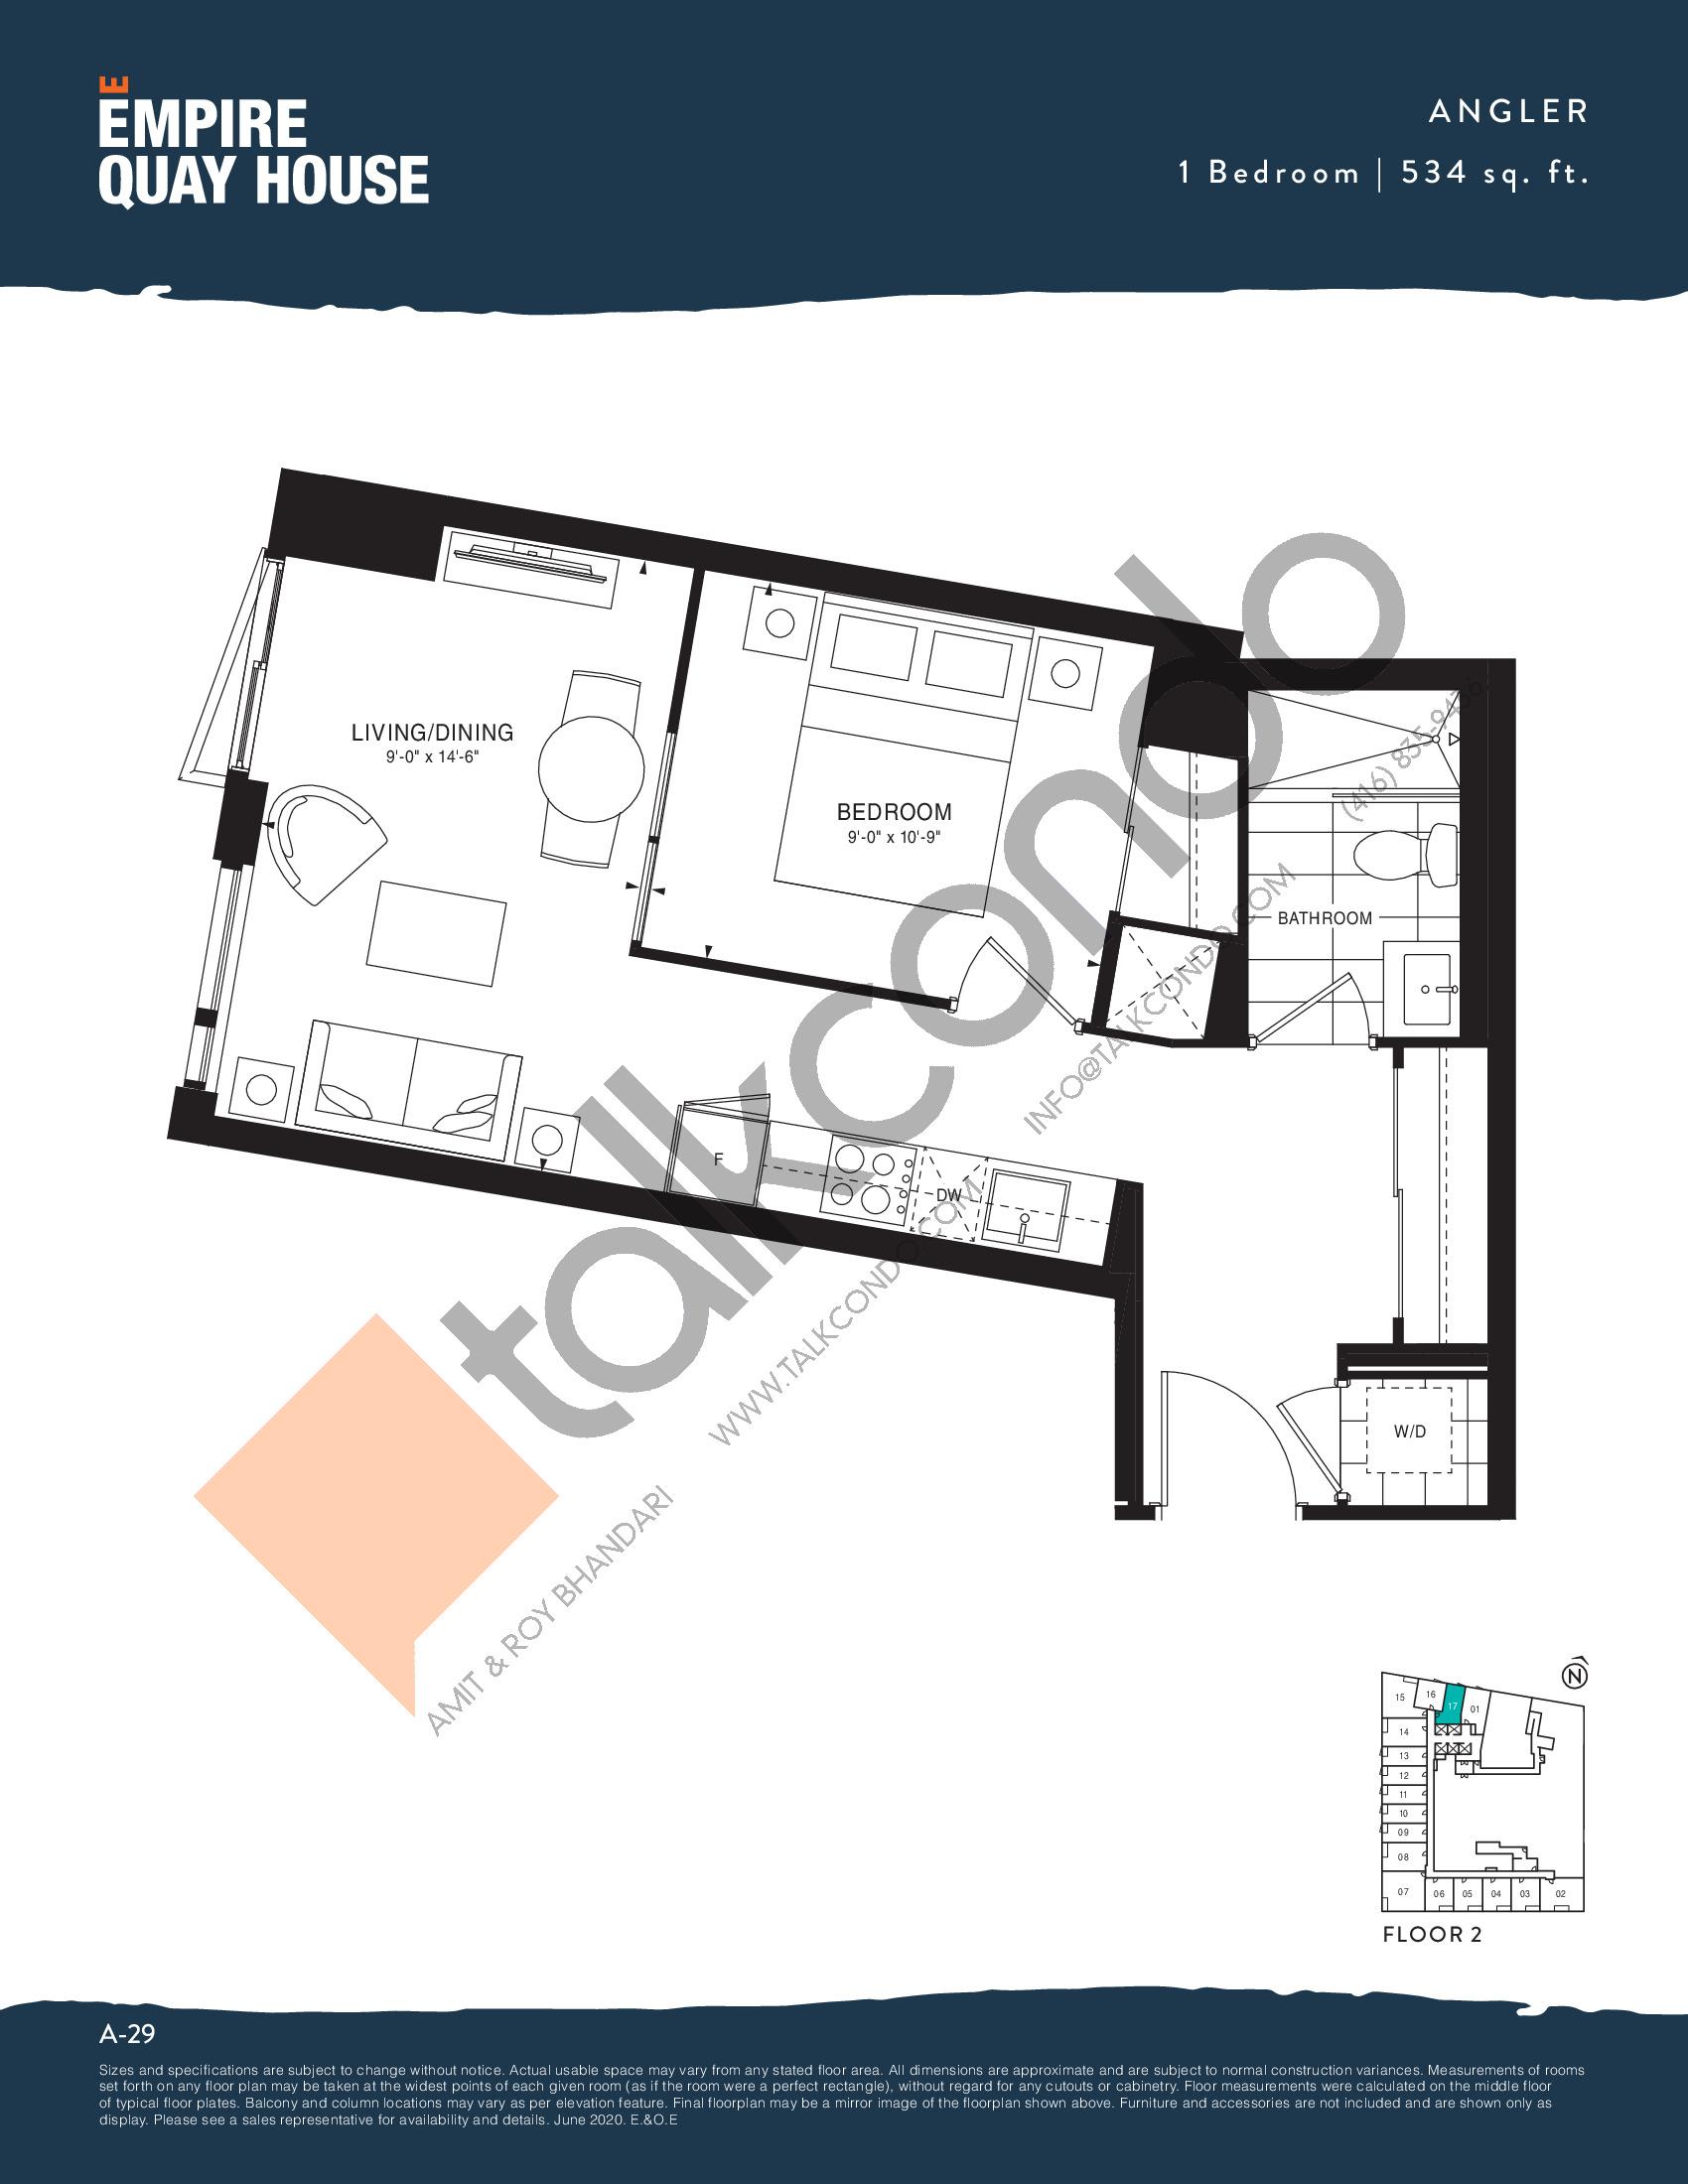 Angler Floor Plan at Empire Quay House Condos - 534 sq.ft